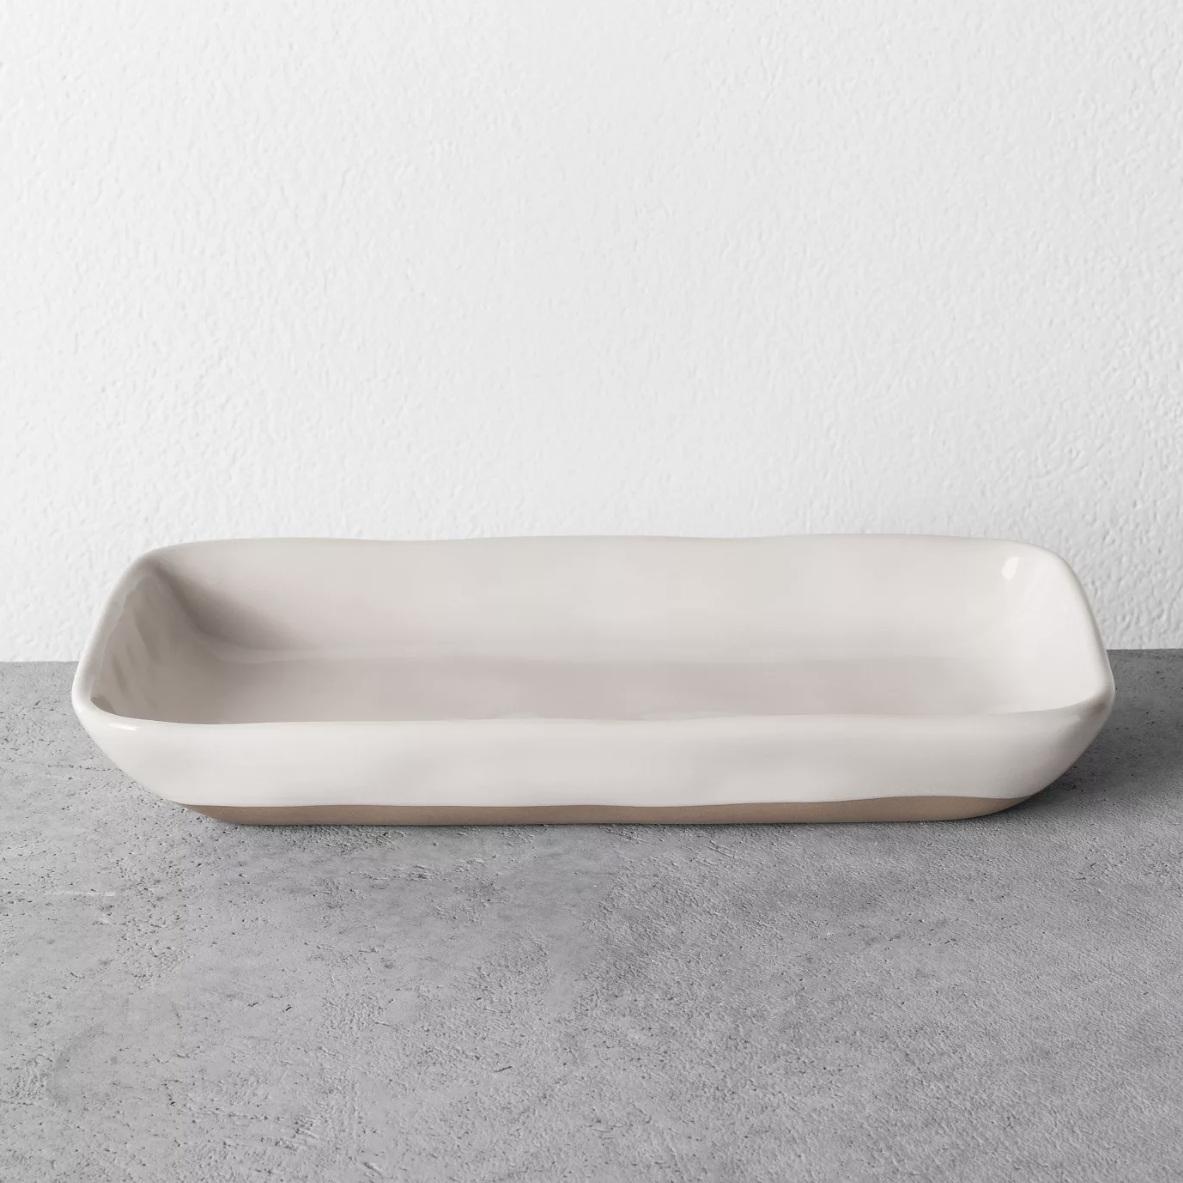 Cream Tray - Hearth & Hand Magnolia bathroom tray, $11.99; Target